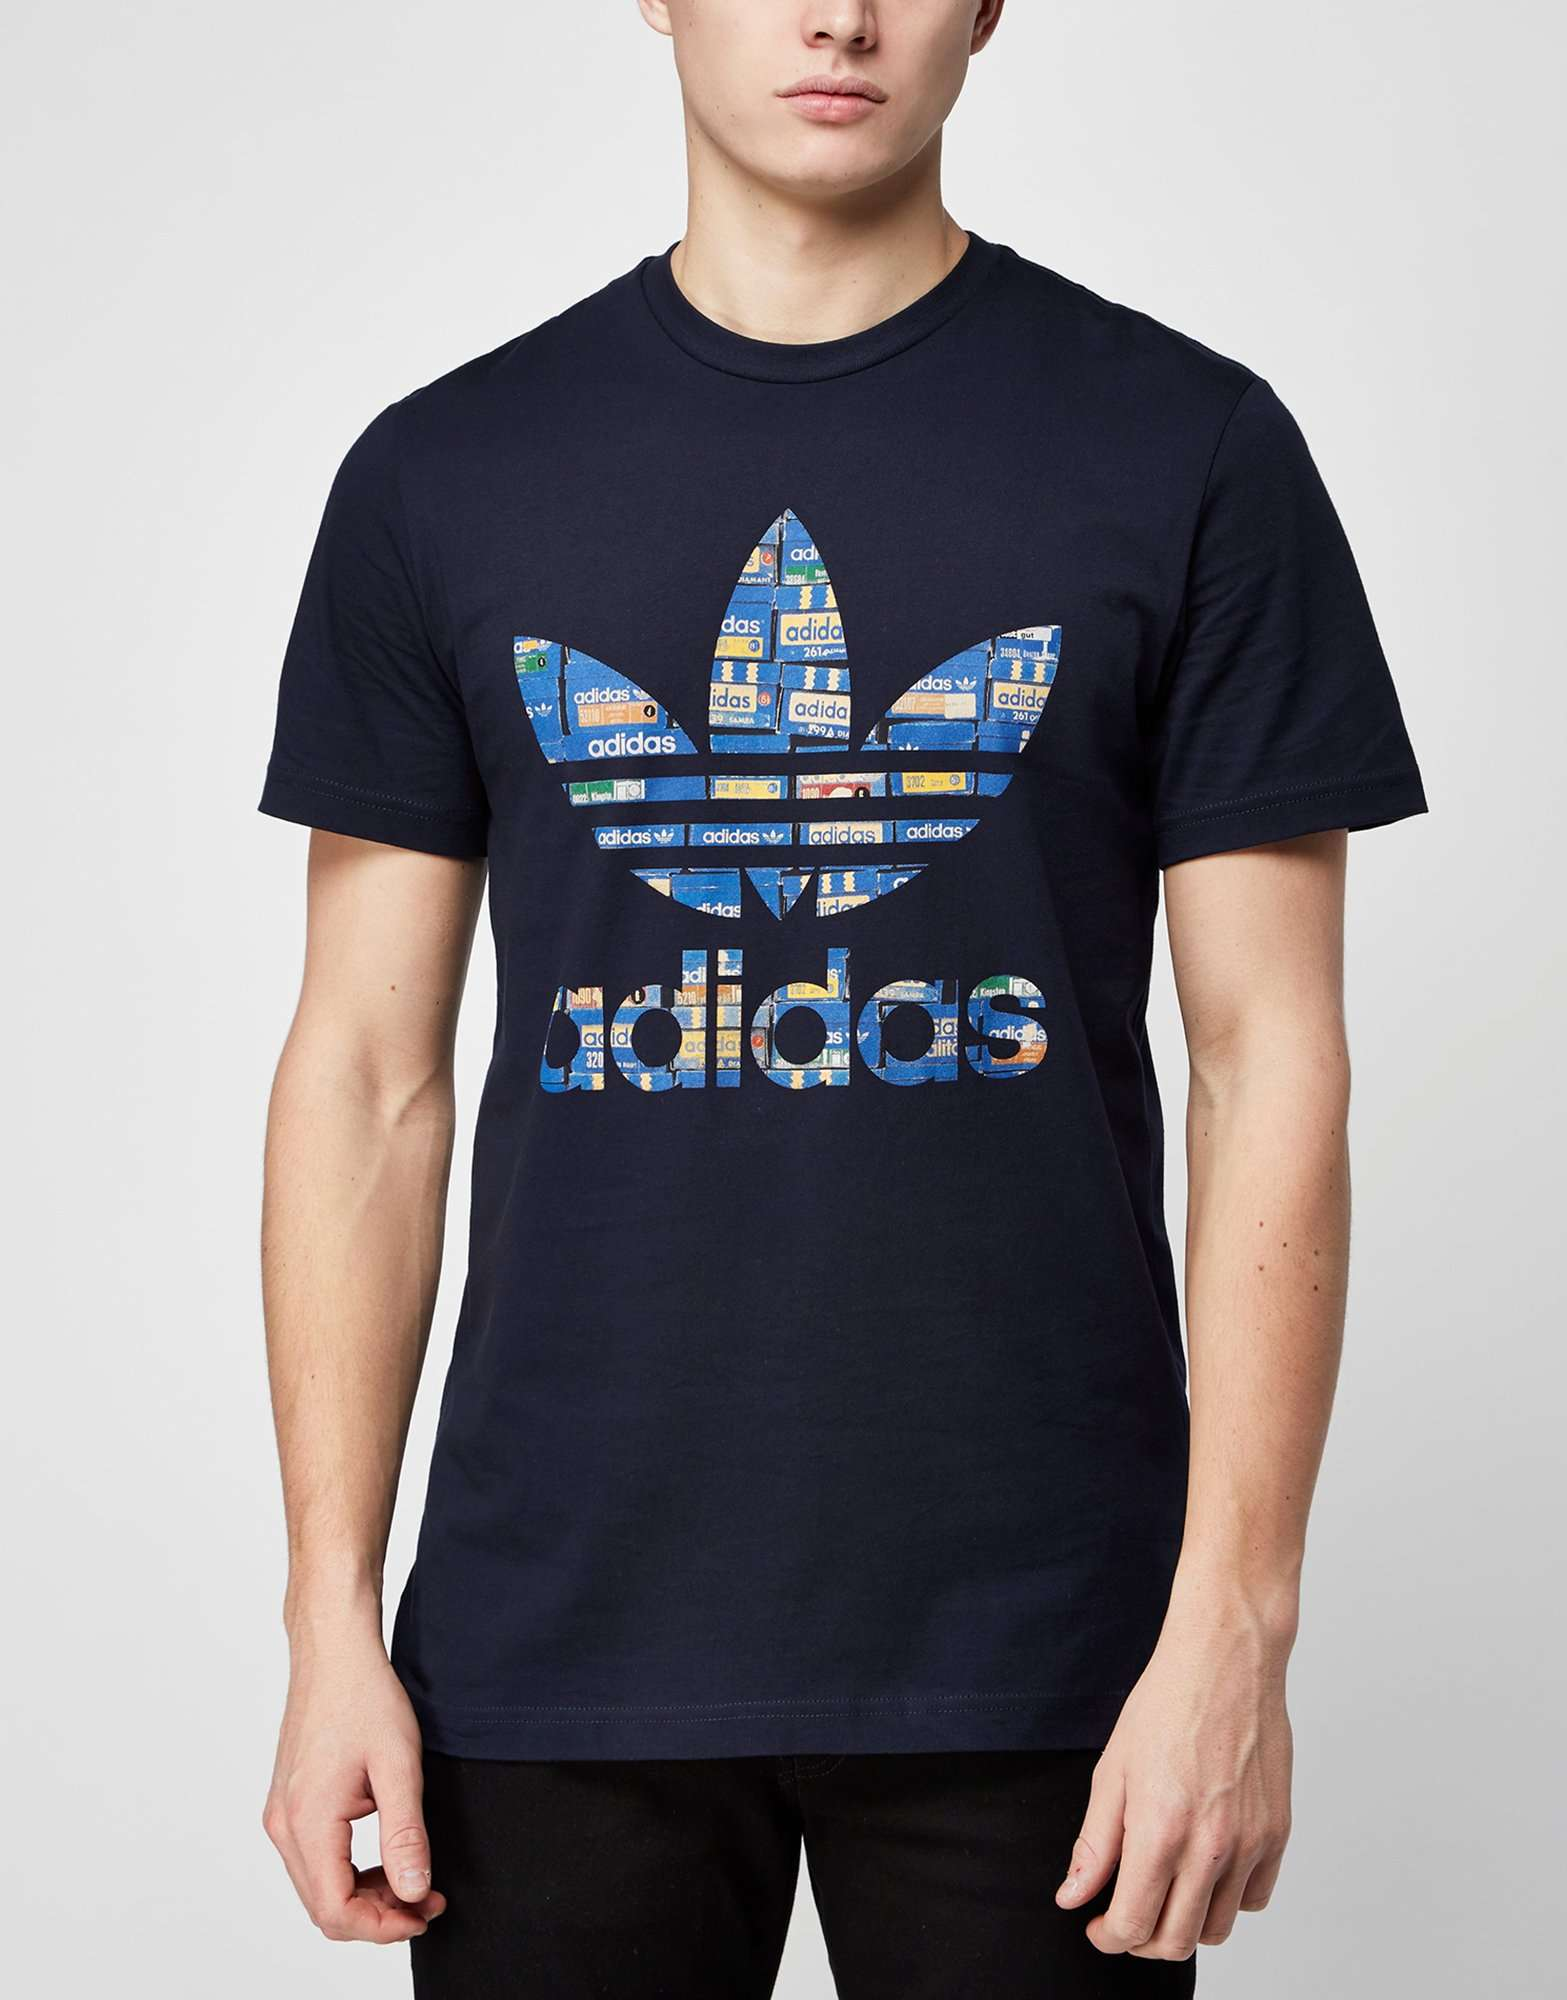 Adidas Originals Shoebox Infil T Shirt Scotts Menswear